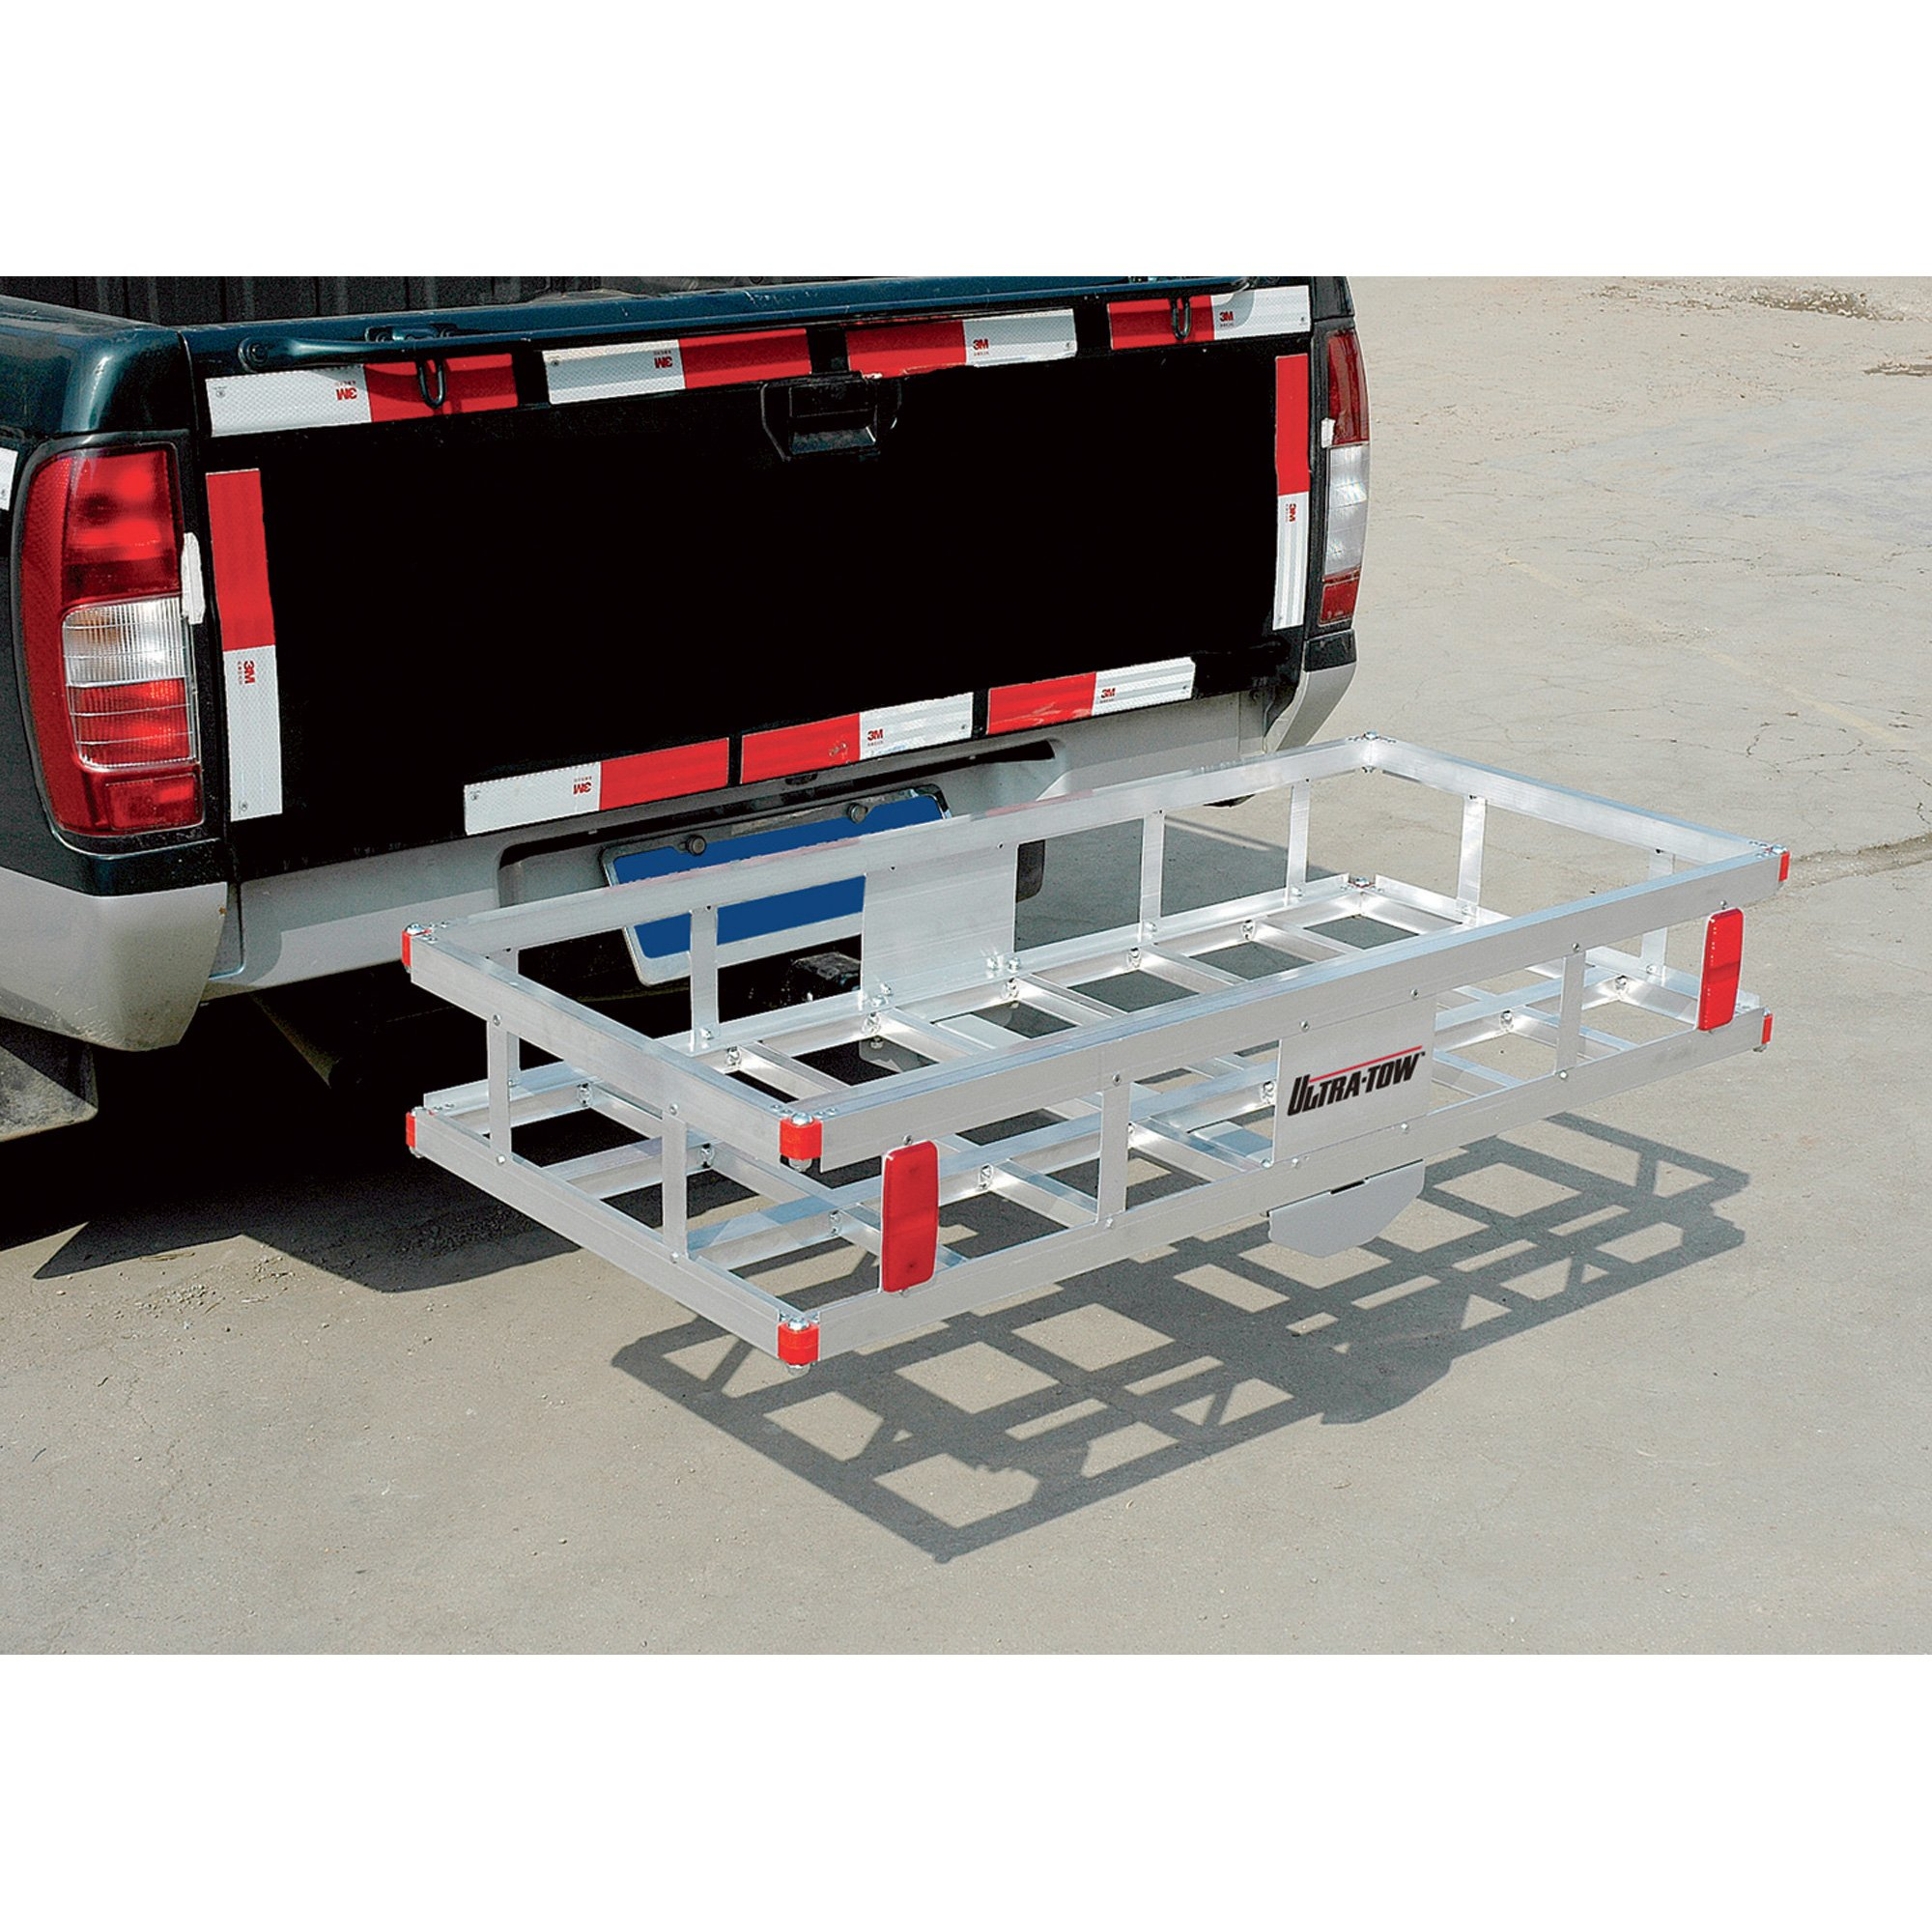 Ultra-Tow Aluminum Cargo Hauler - 500-Lb. Capacity by Ultra-Tow